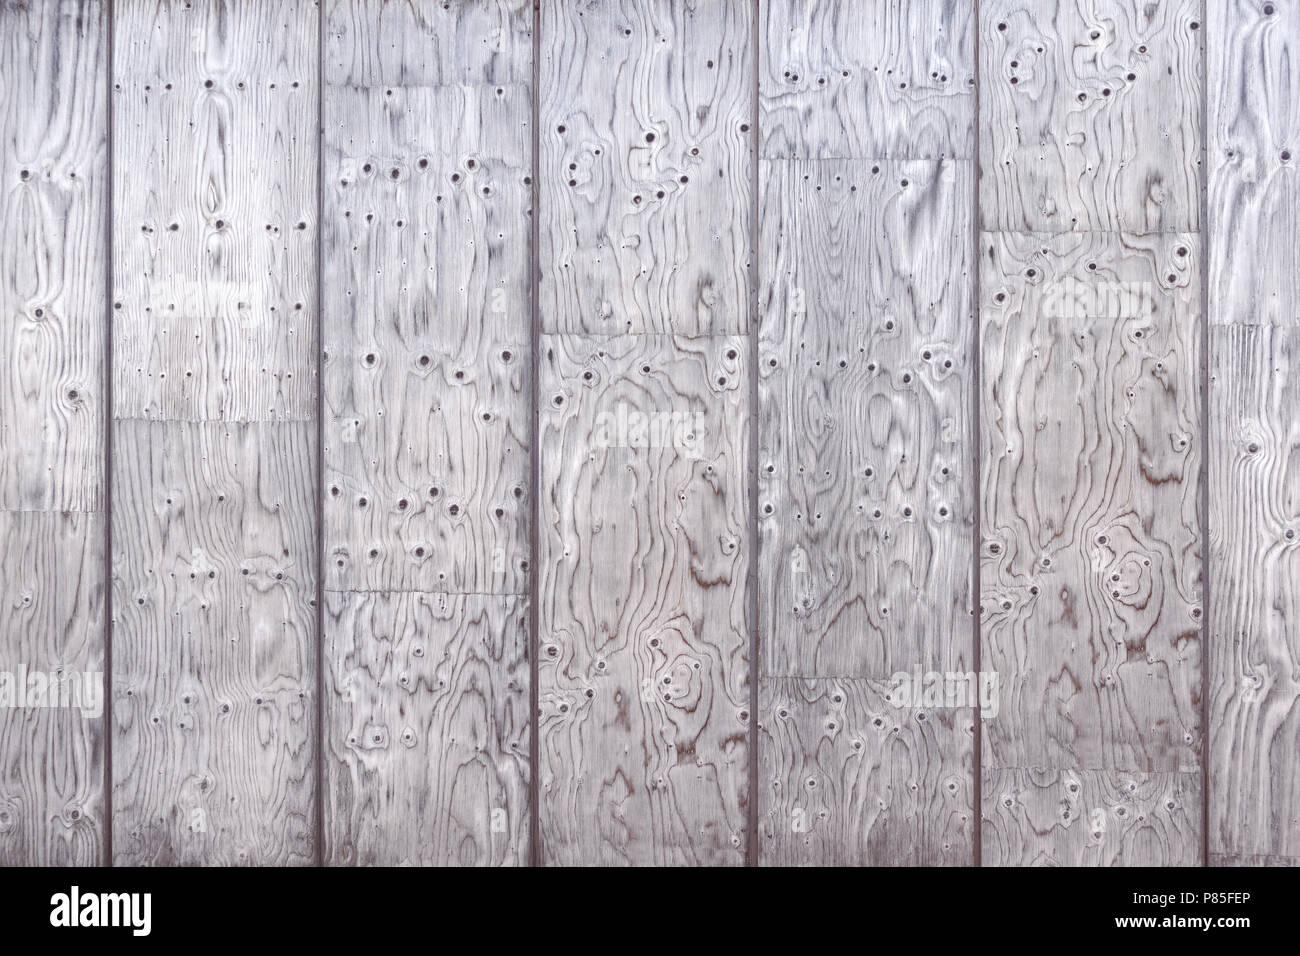 Textura de madera de paneles murales Imagen De Stock